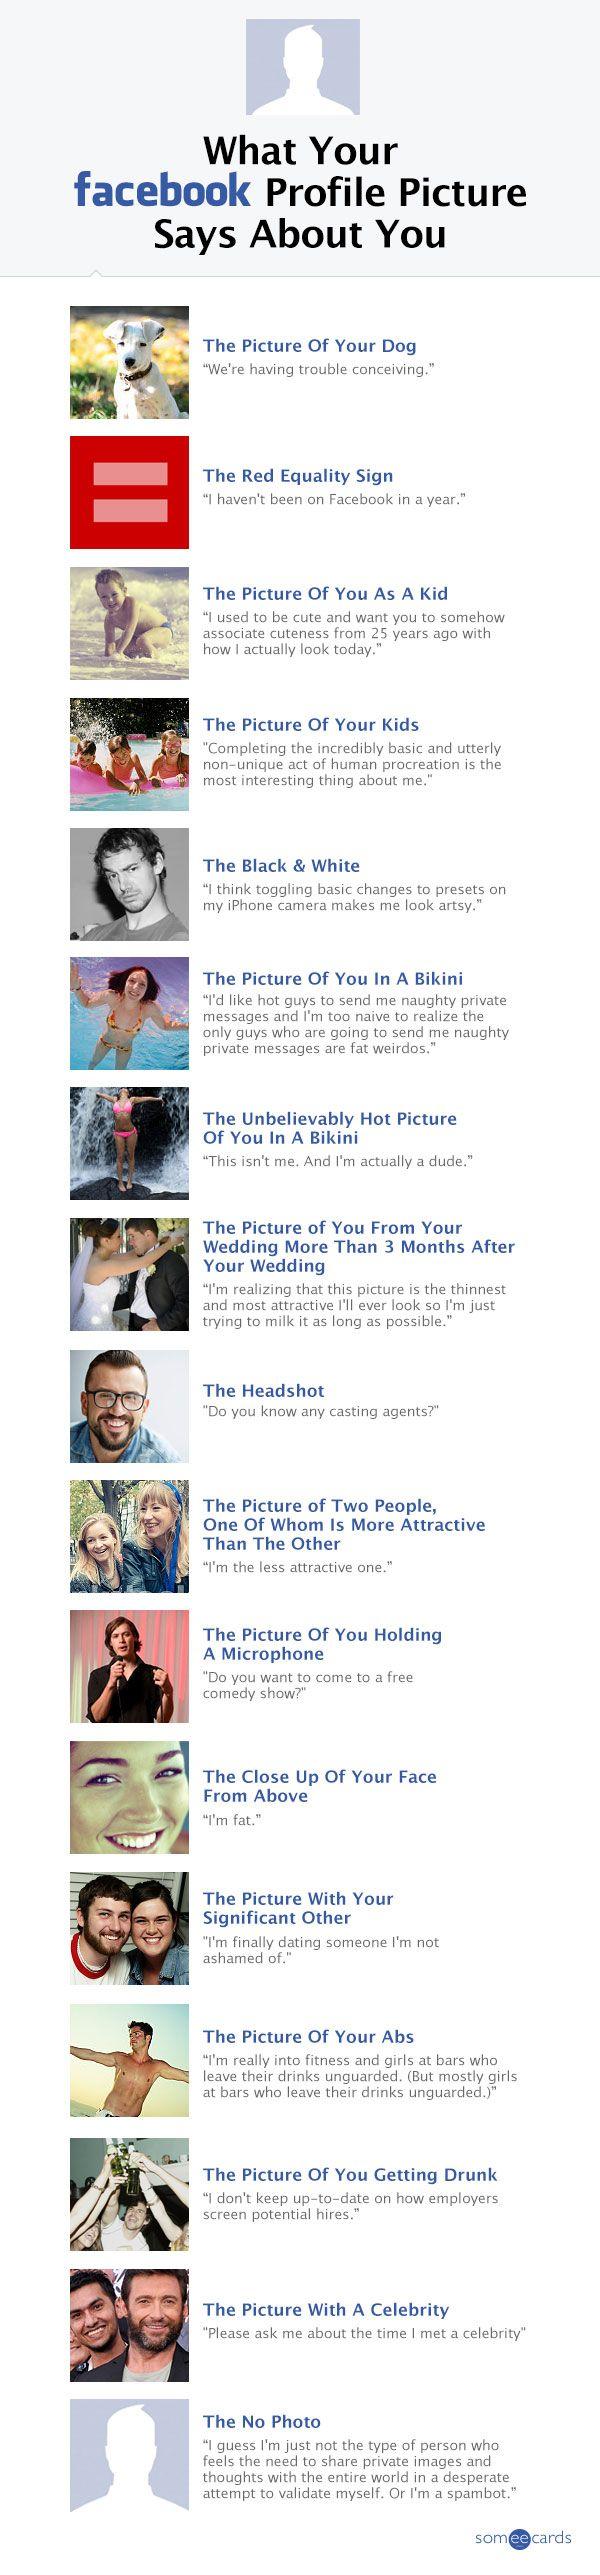 Make Funny Facebook Profile Pics | galleryhip.com - The Hippest ...